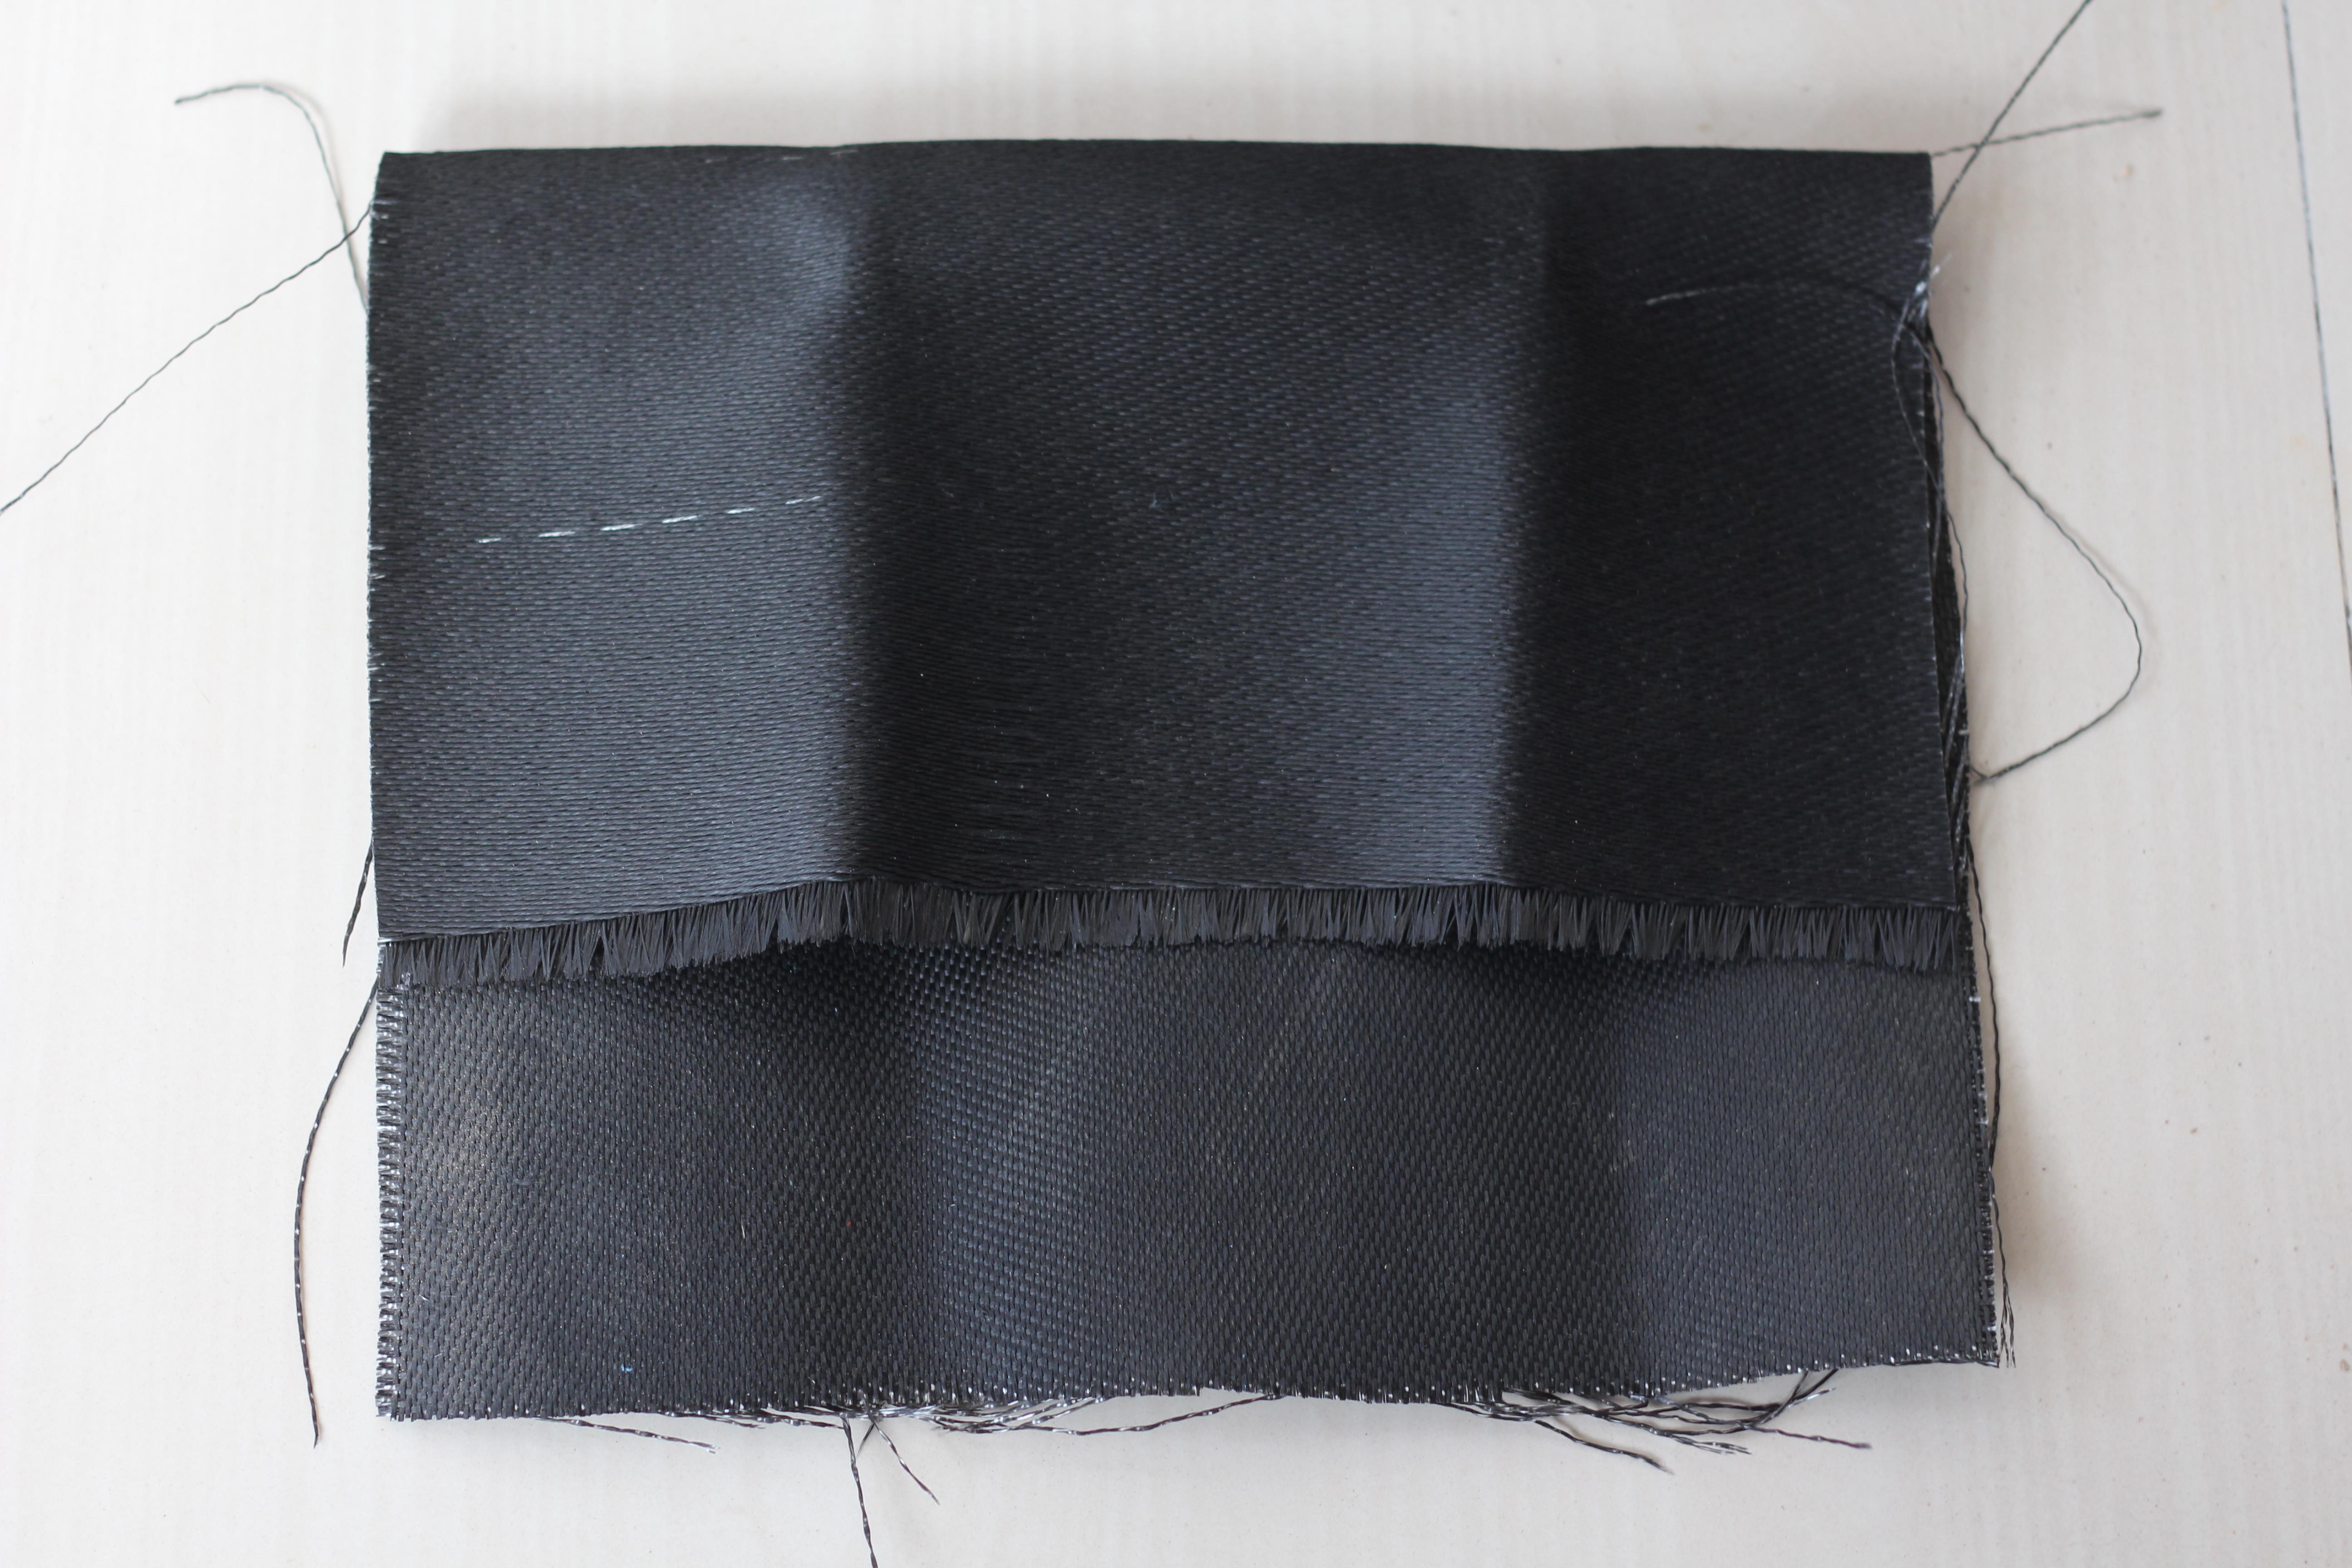 Graphite Coated Fiberglass Fire Blanket